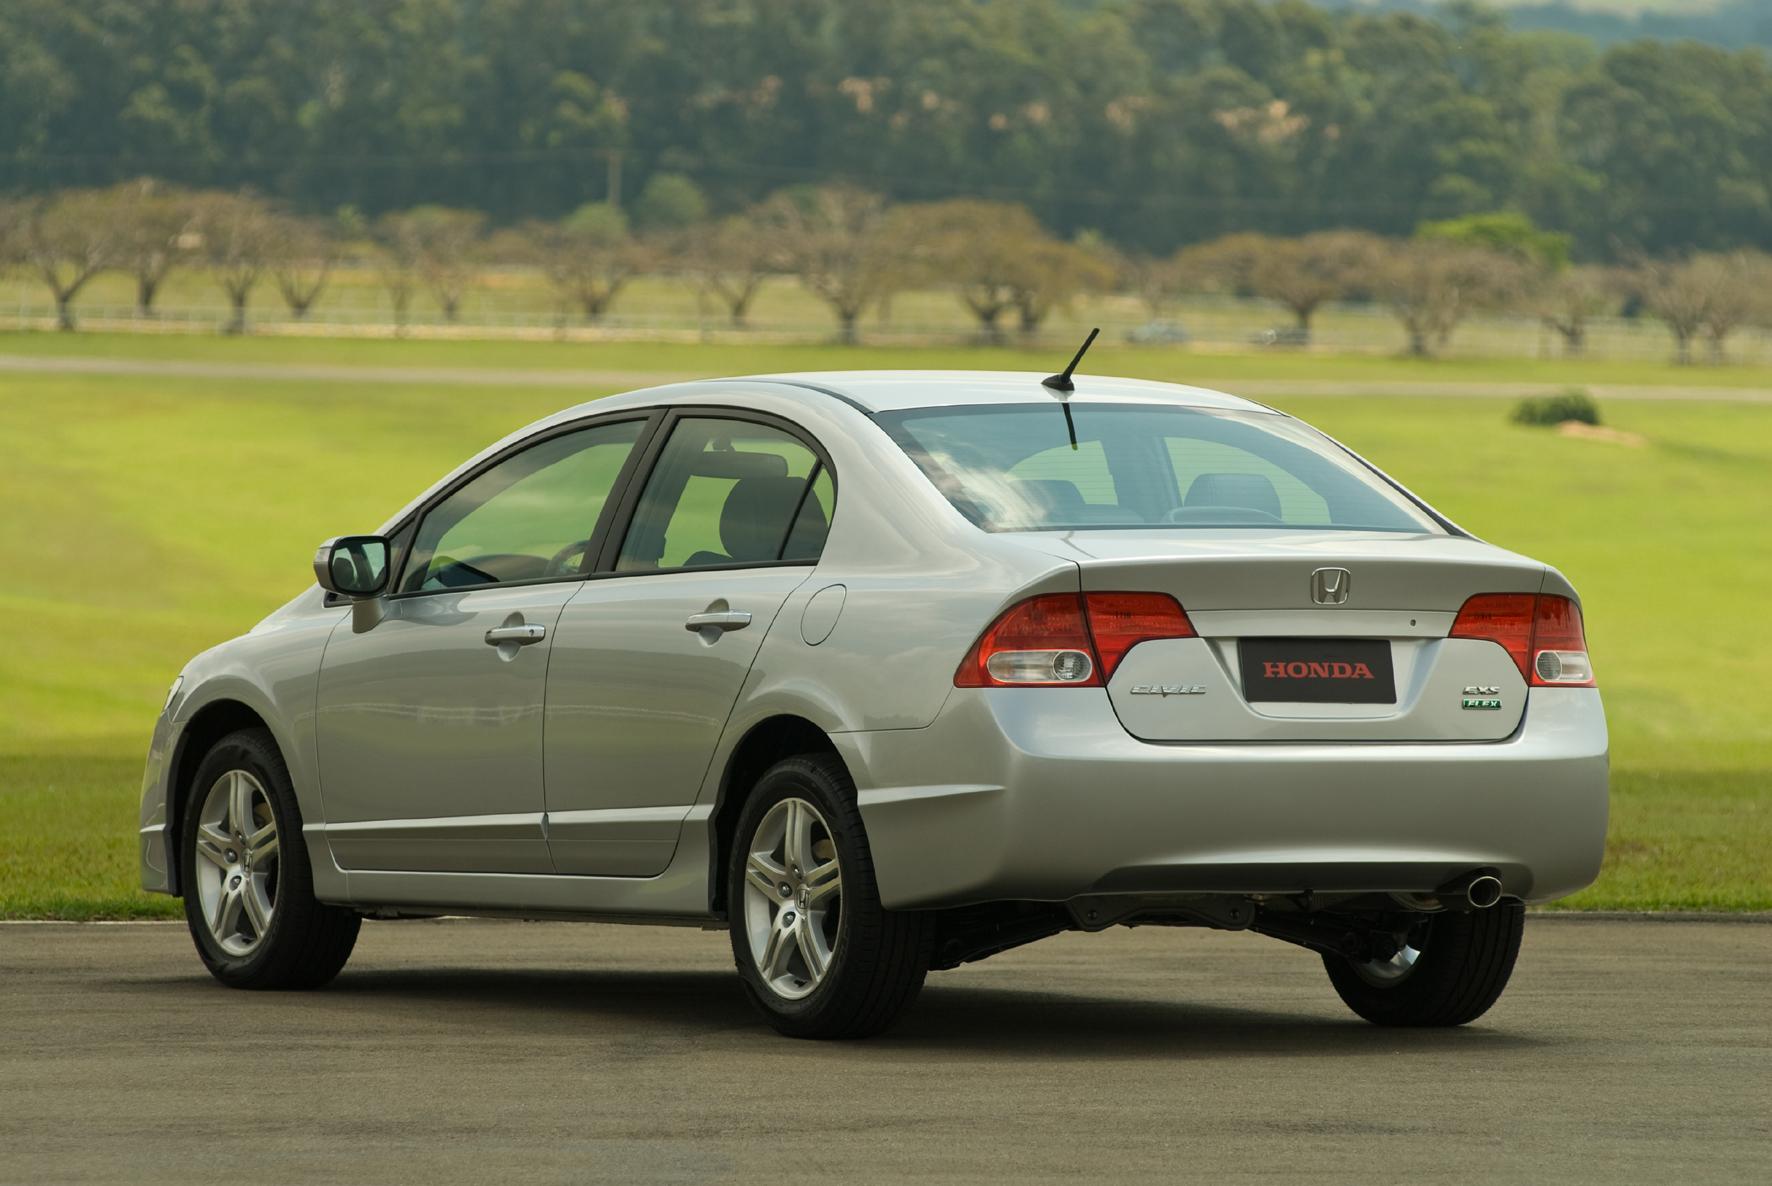 Honda apresenta Civic 2009